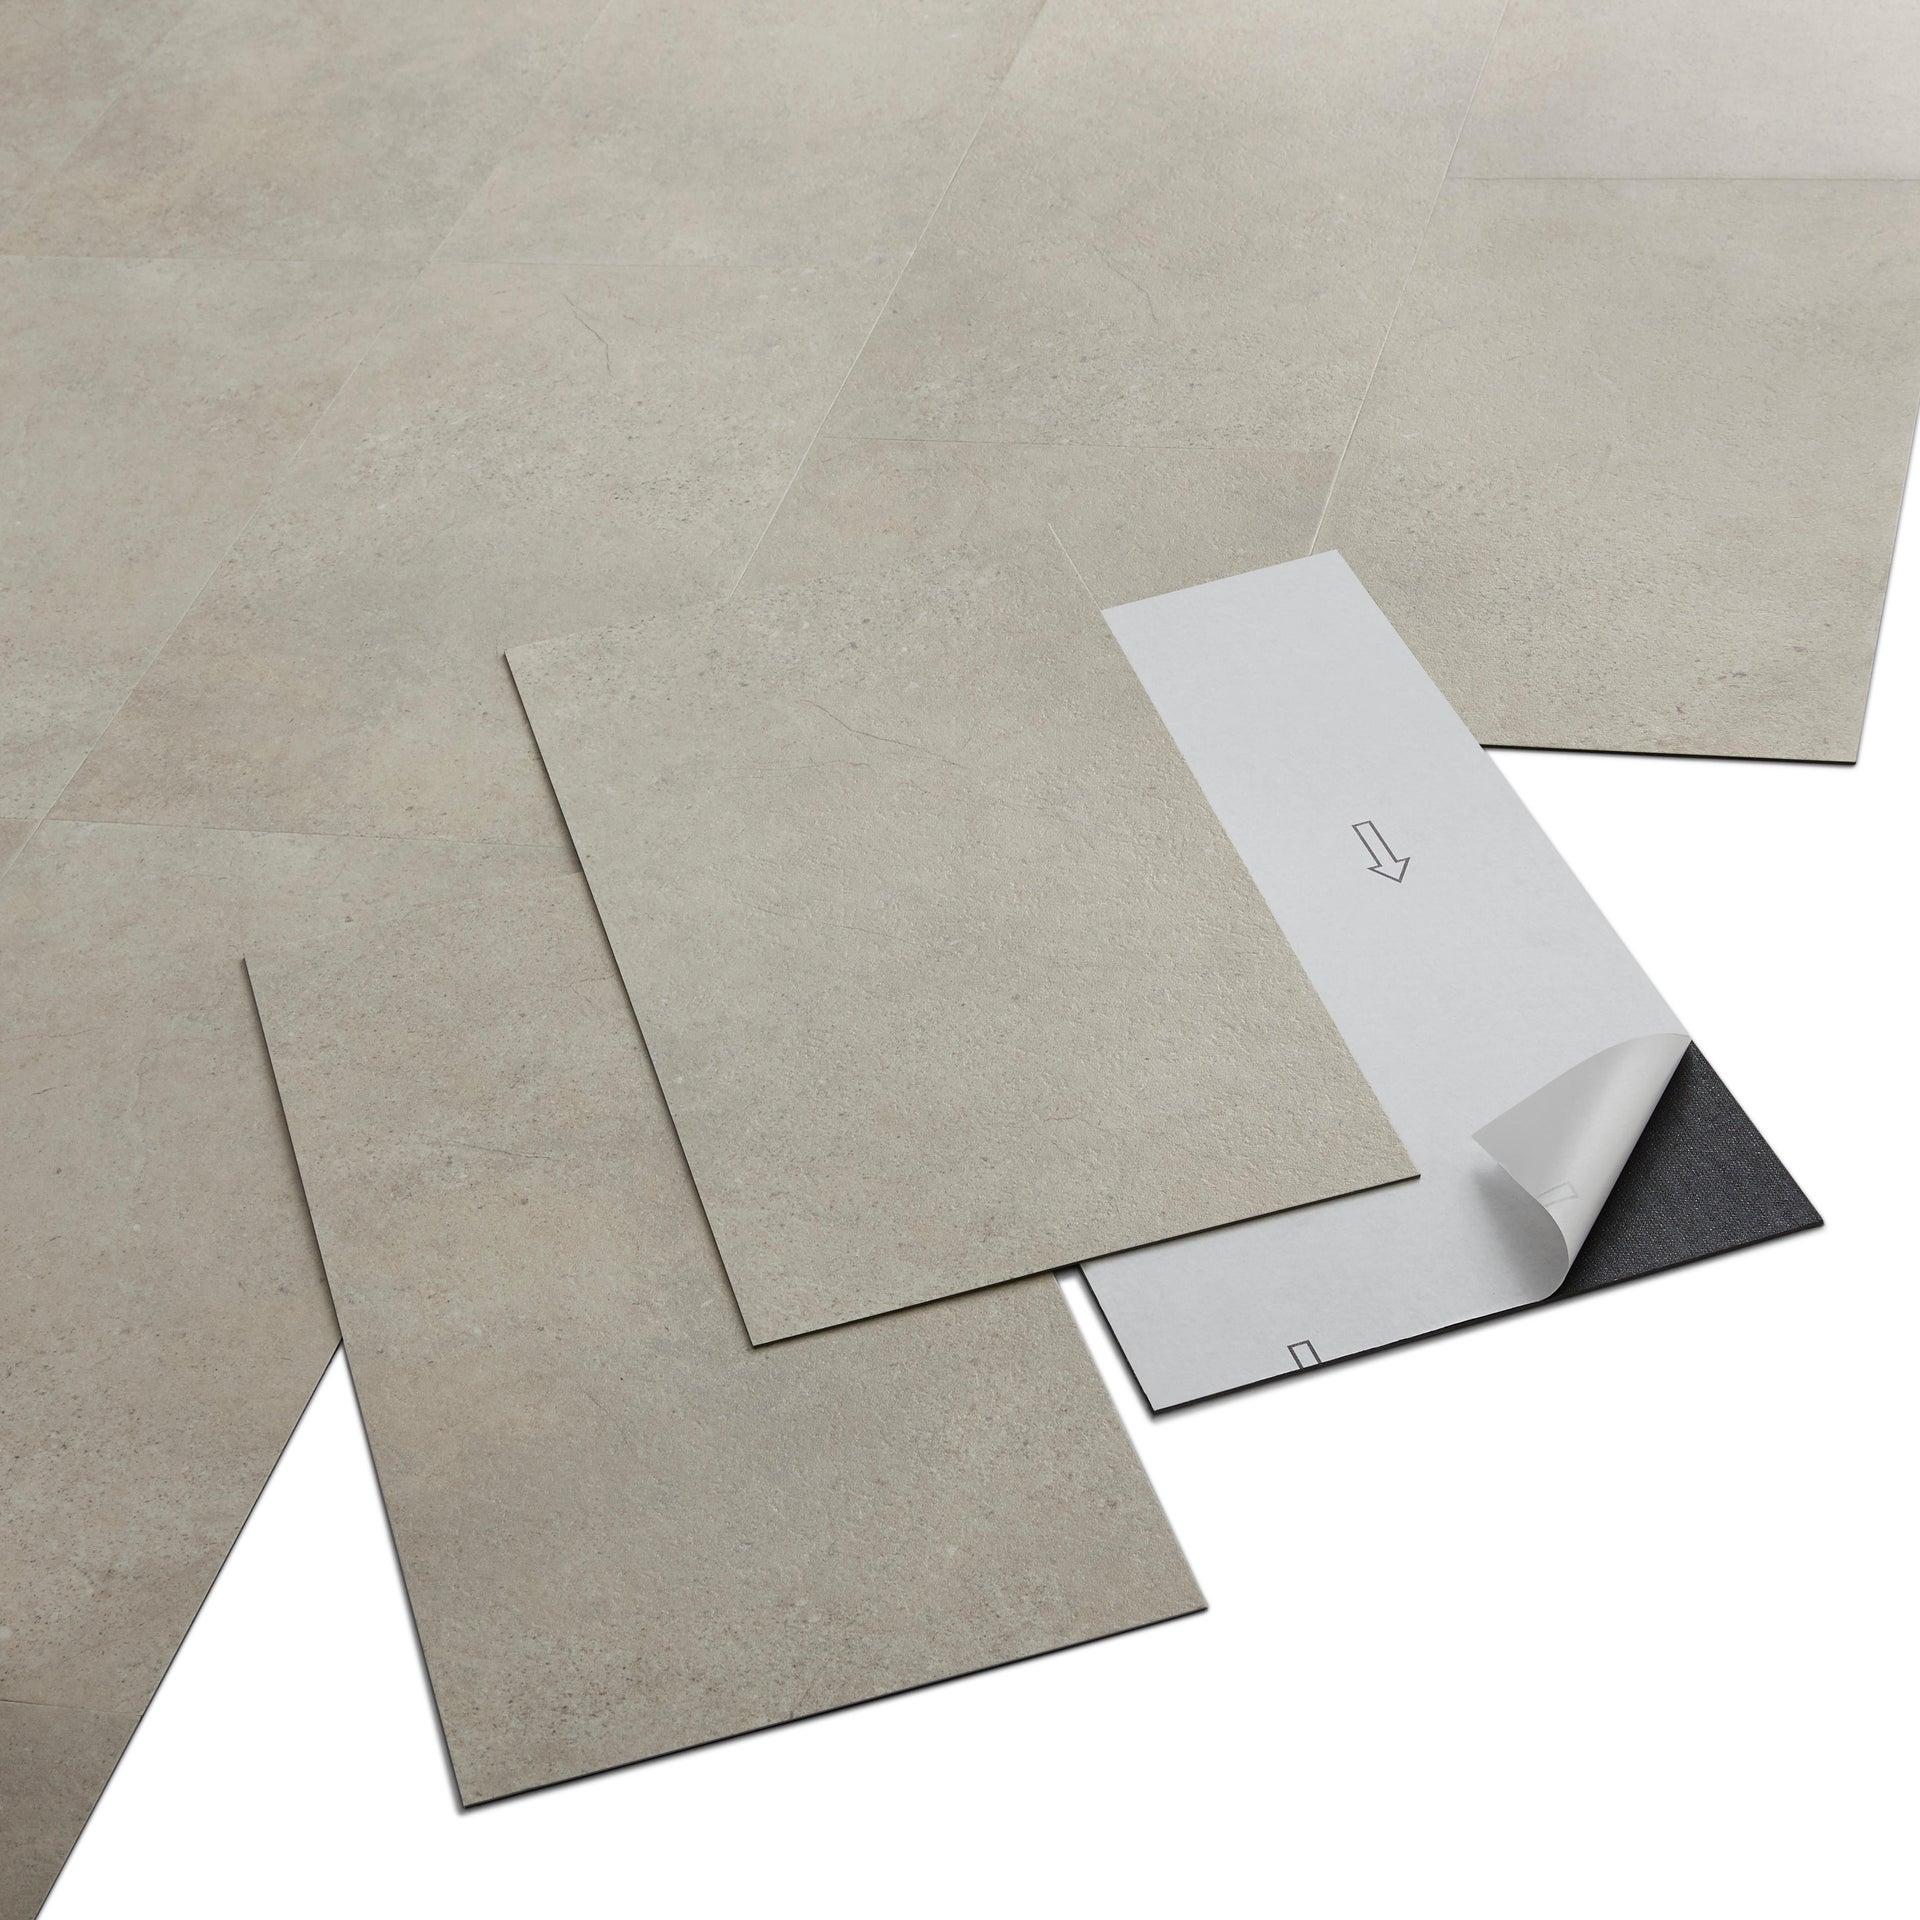 Pavimento PVC adesivo Limestone Sp 2 mm grigio / argento - 9